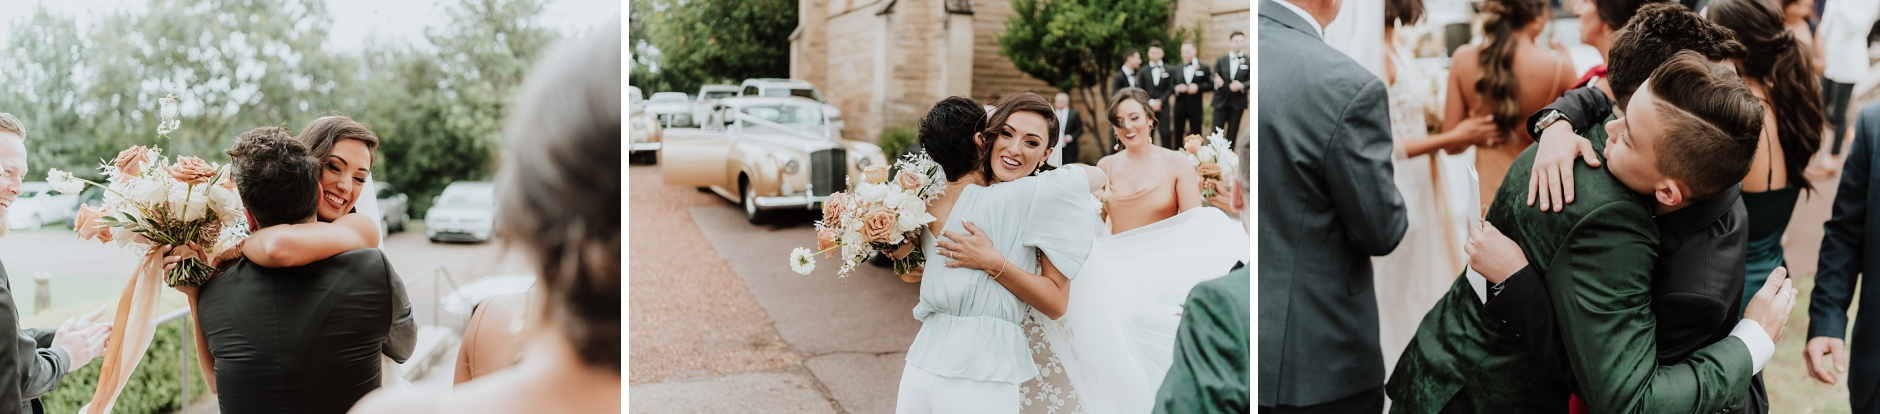 Sydney-Wedding-Photographer_0103.jpg